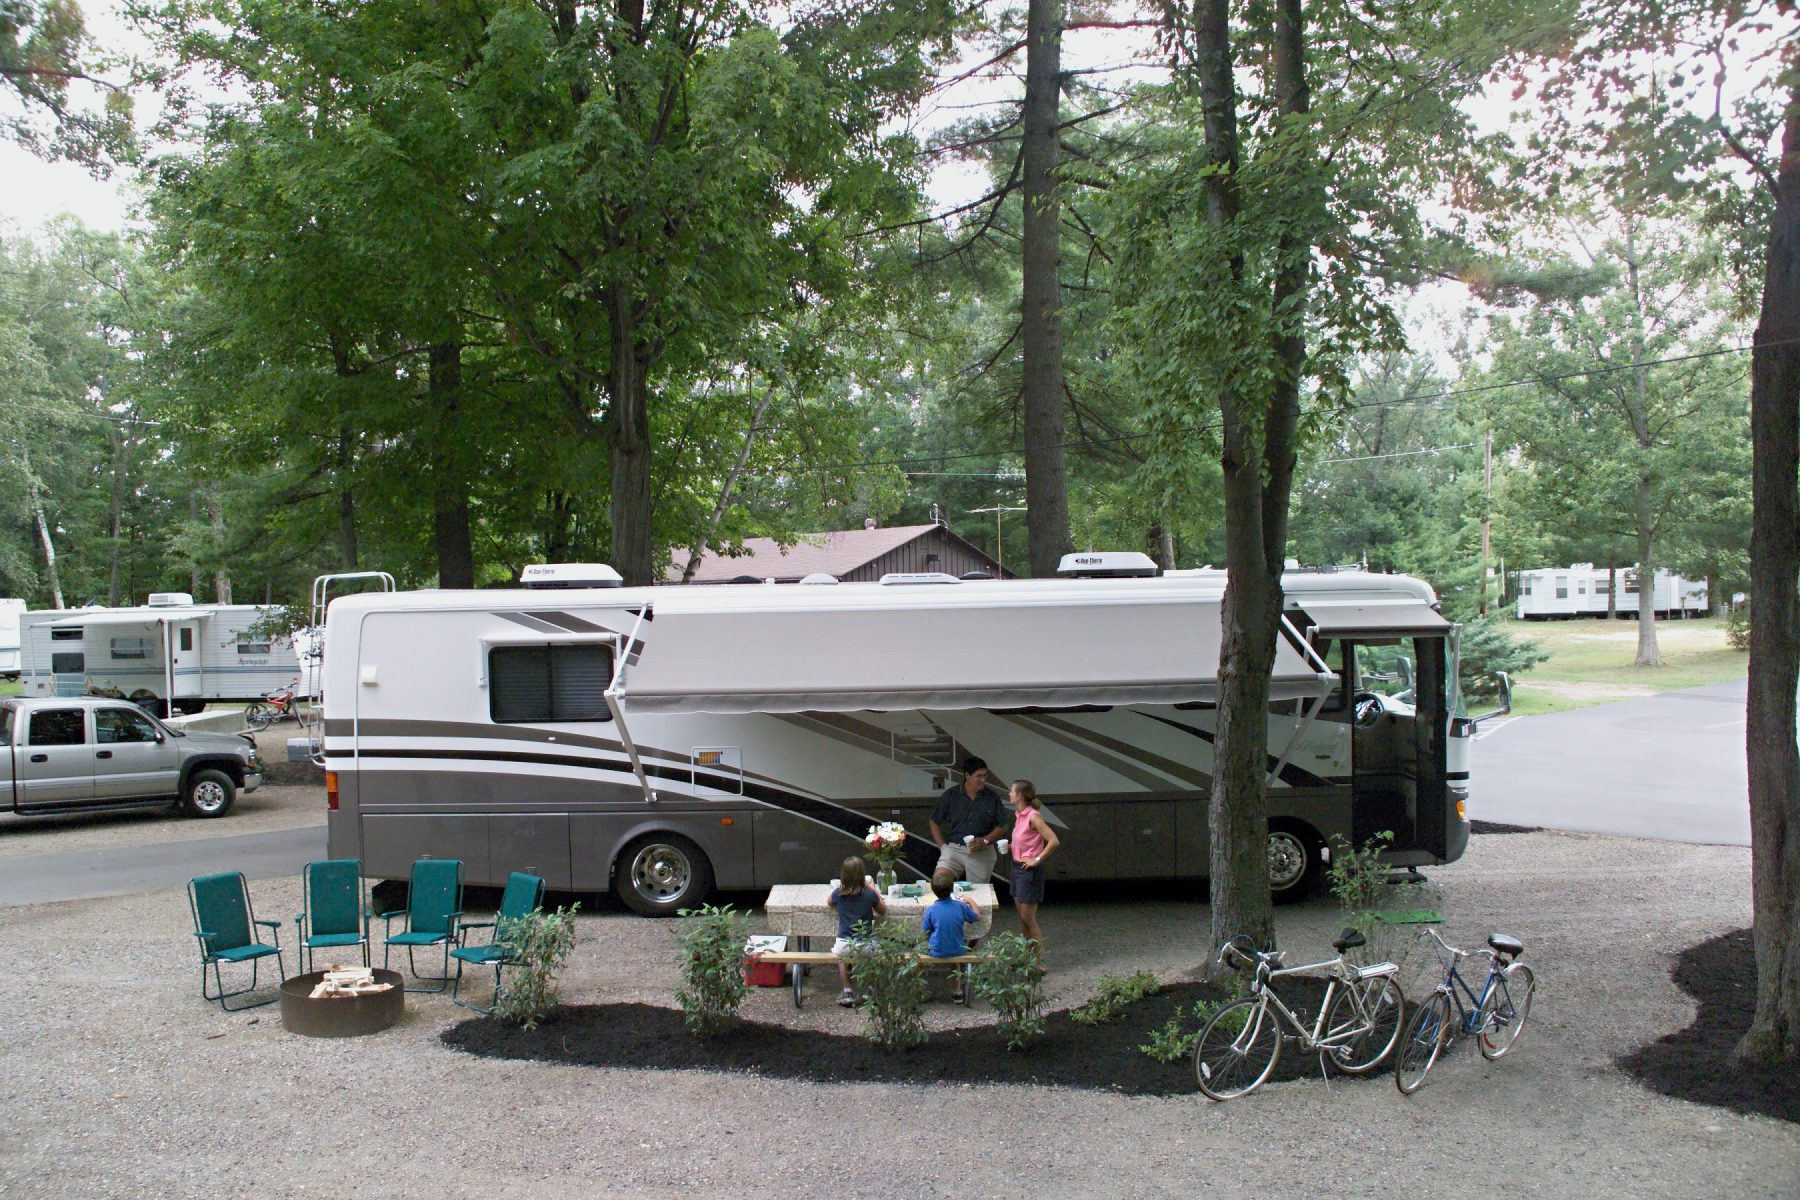 RV setup in campsite